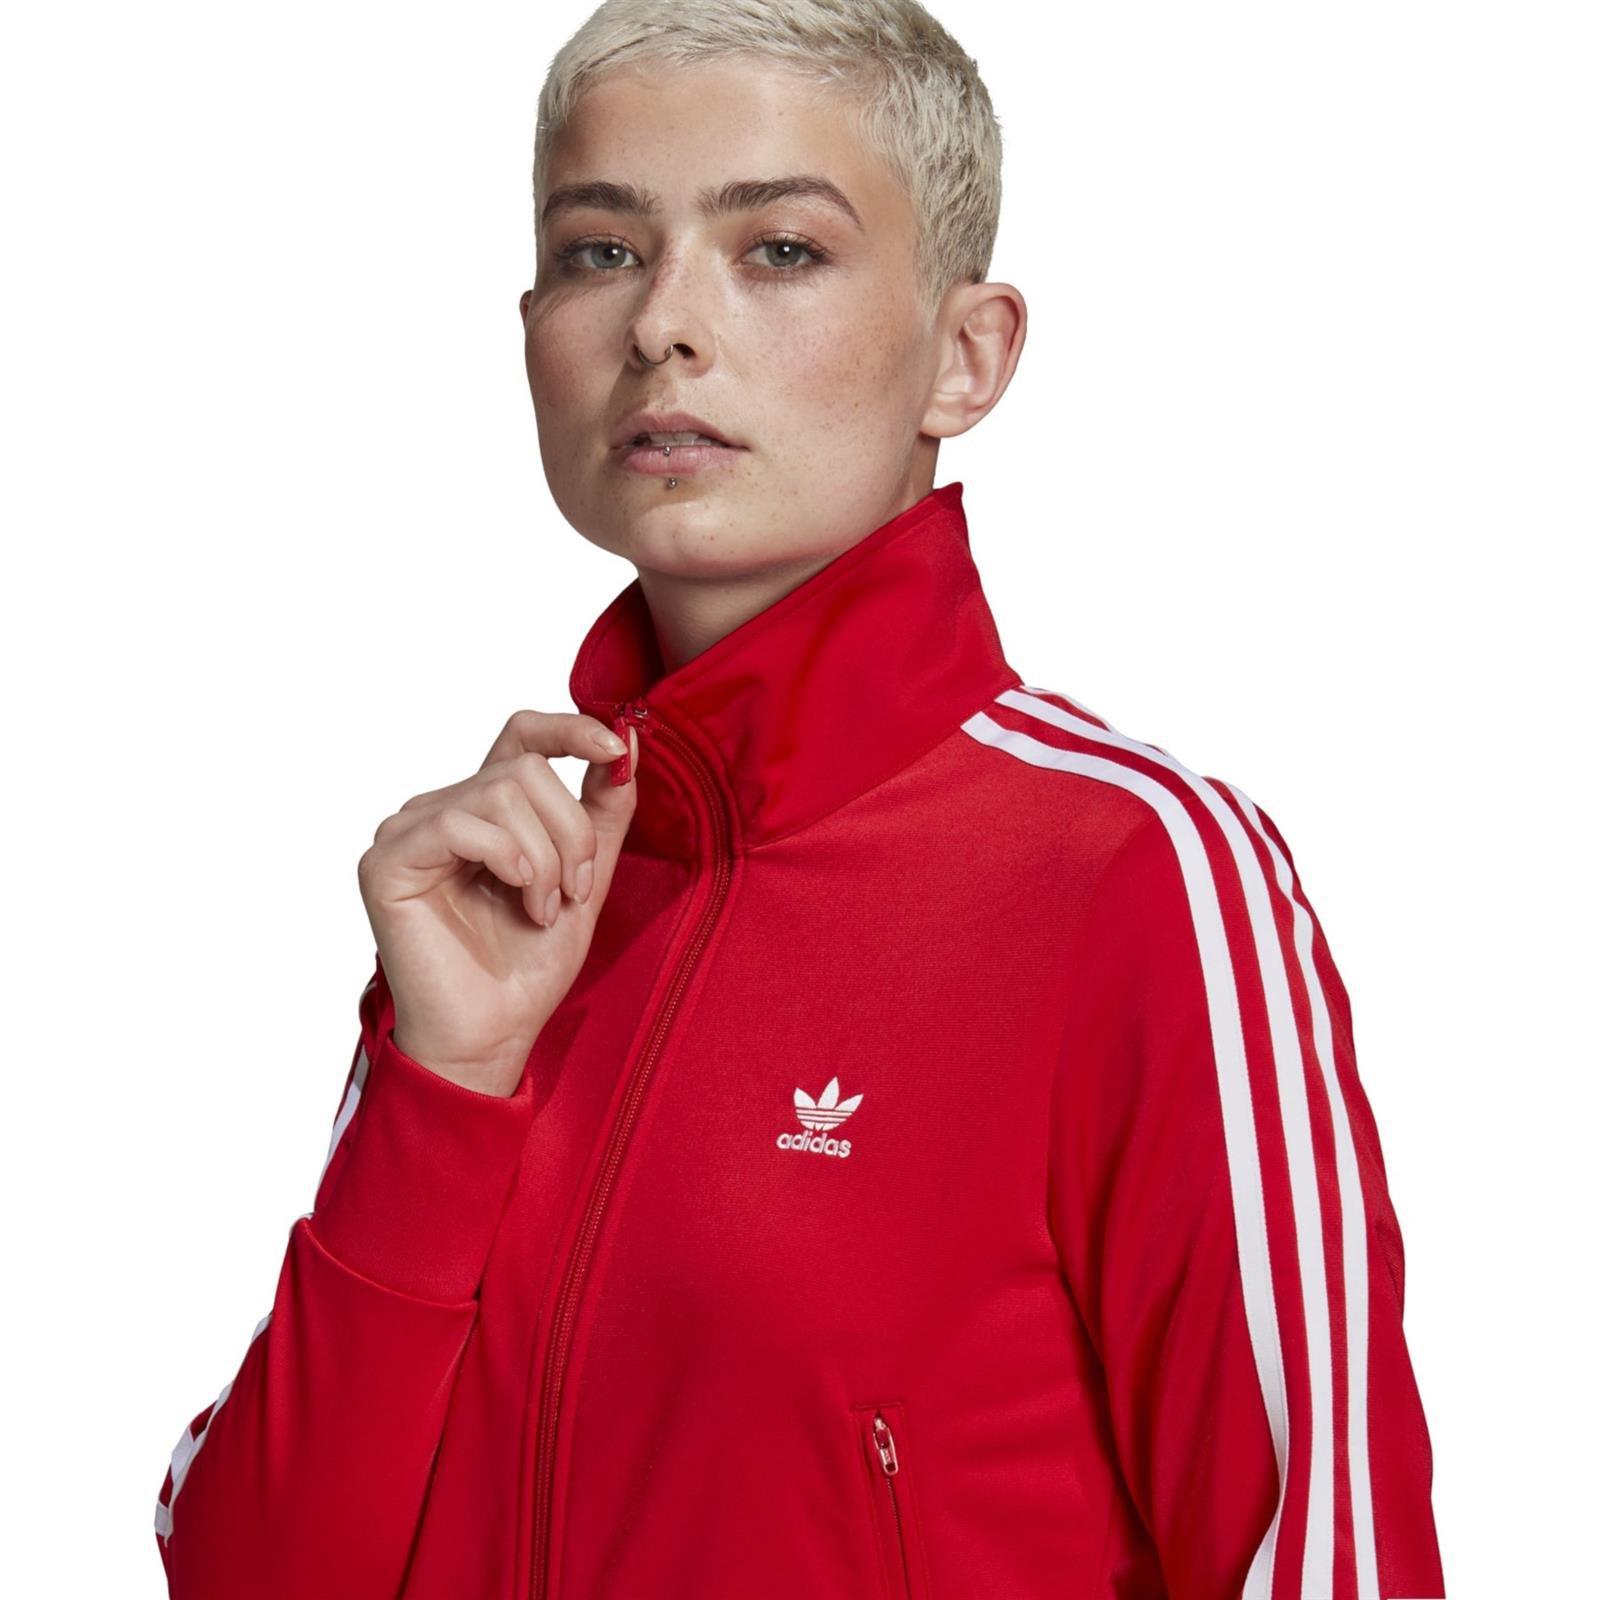 Bluza damska adidas Originals Firebird czerwona GN2818 - Sportroom.pl